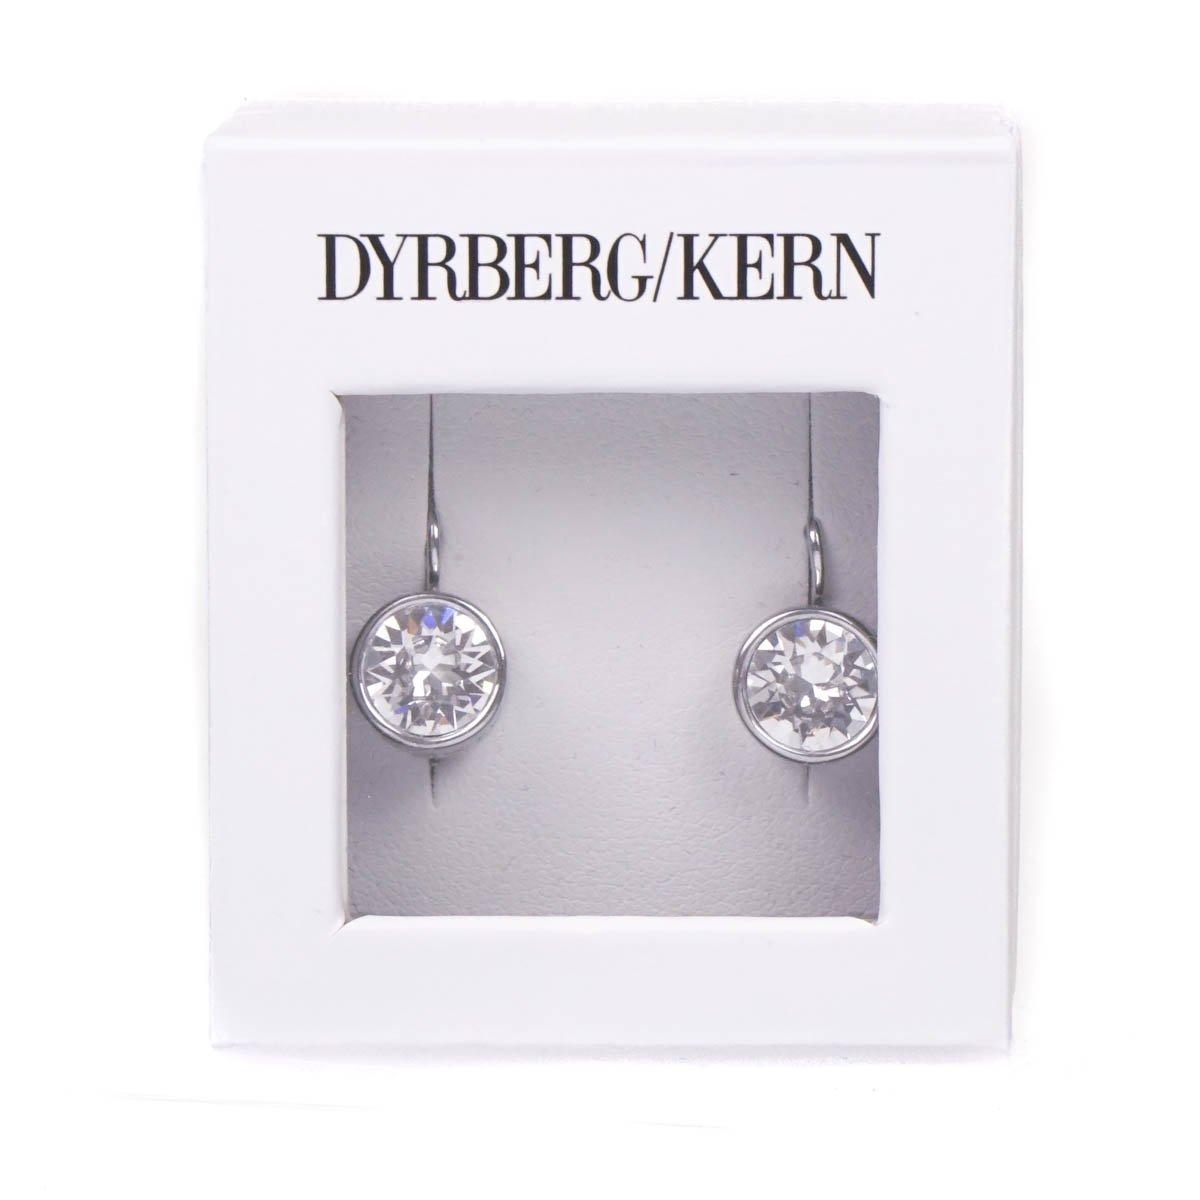 8c7b438d34093 Dyrberg/Kern Louise Swarovski Crystal French Hook Silver Plated Earrings